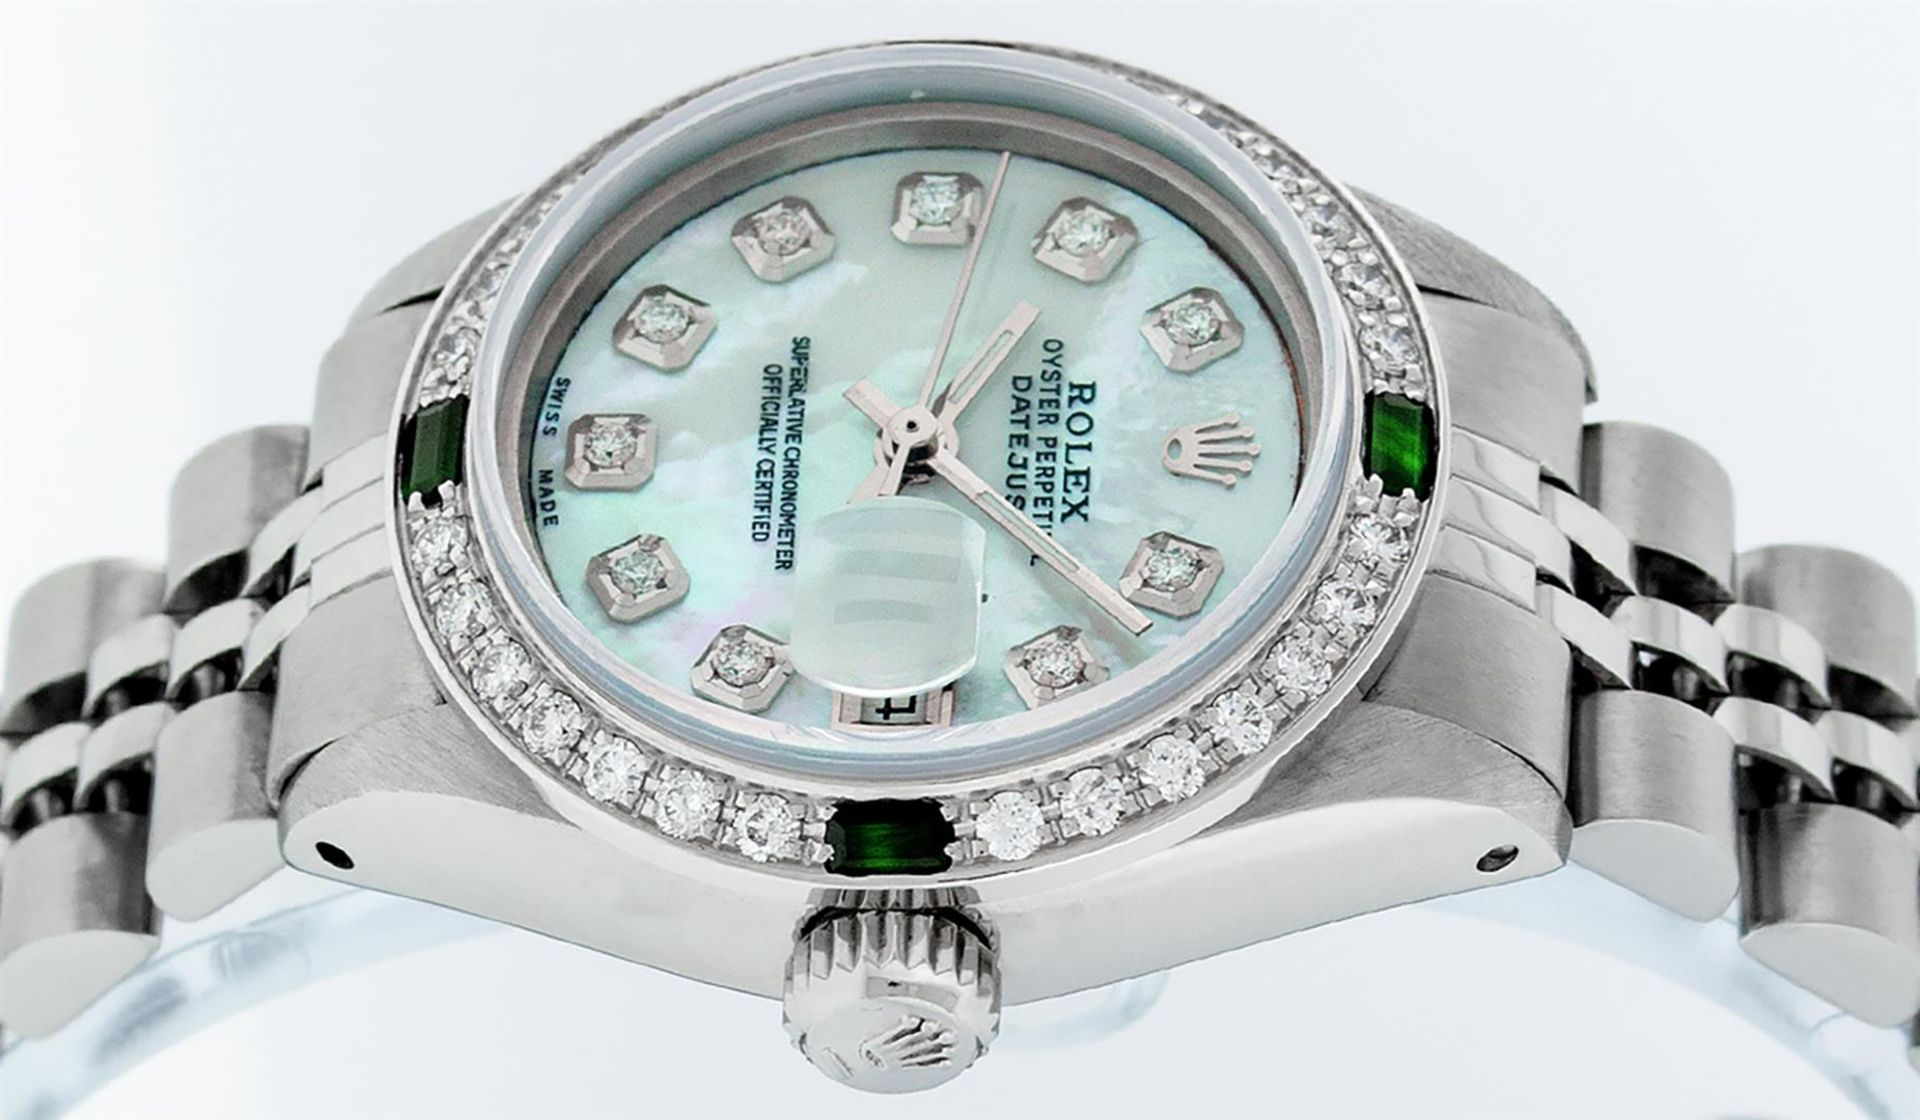 Rolex Ladies Stainless Steel Blue MOP Diamond & Emerald Datejust Wristwatch - Image 4 of 9